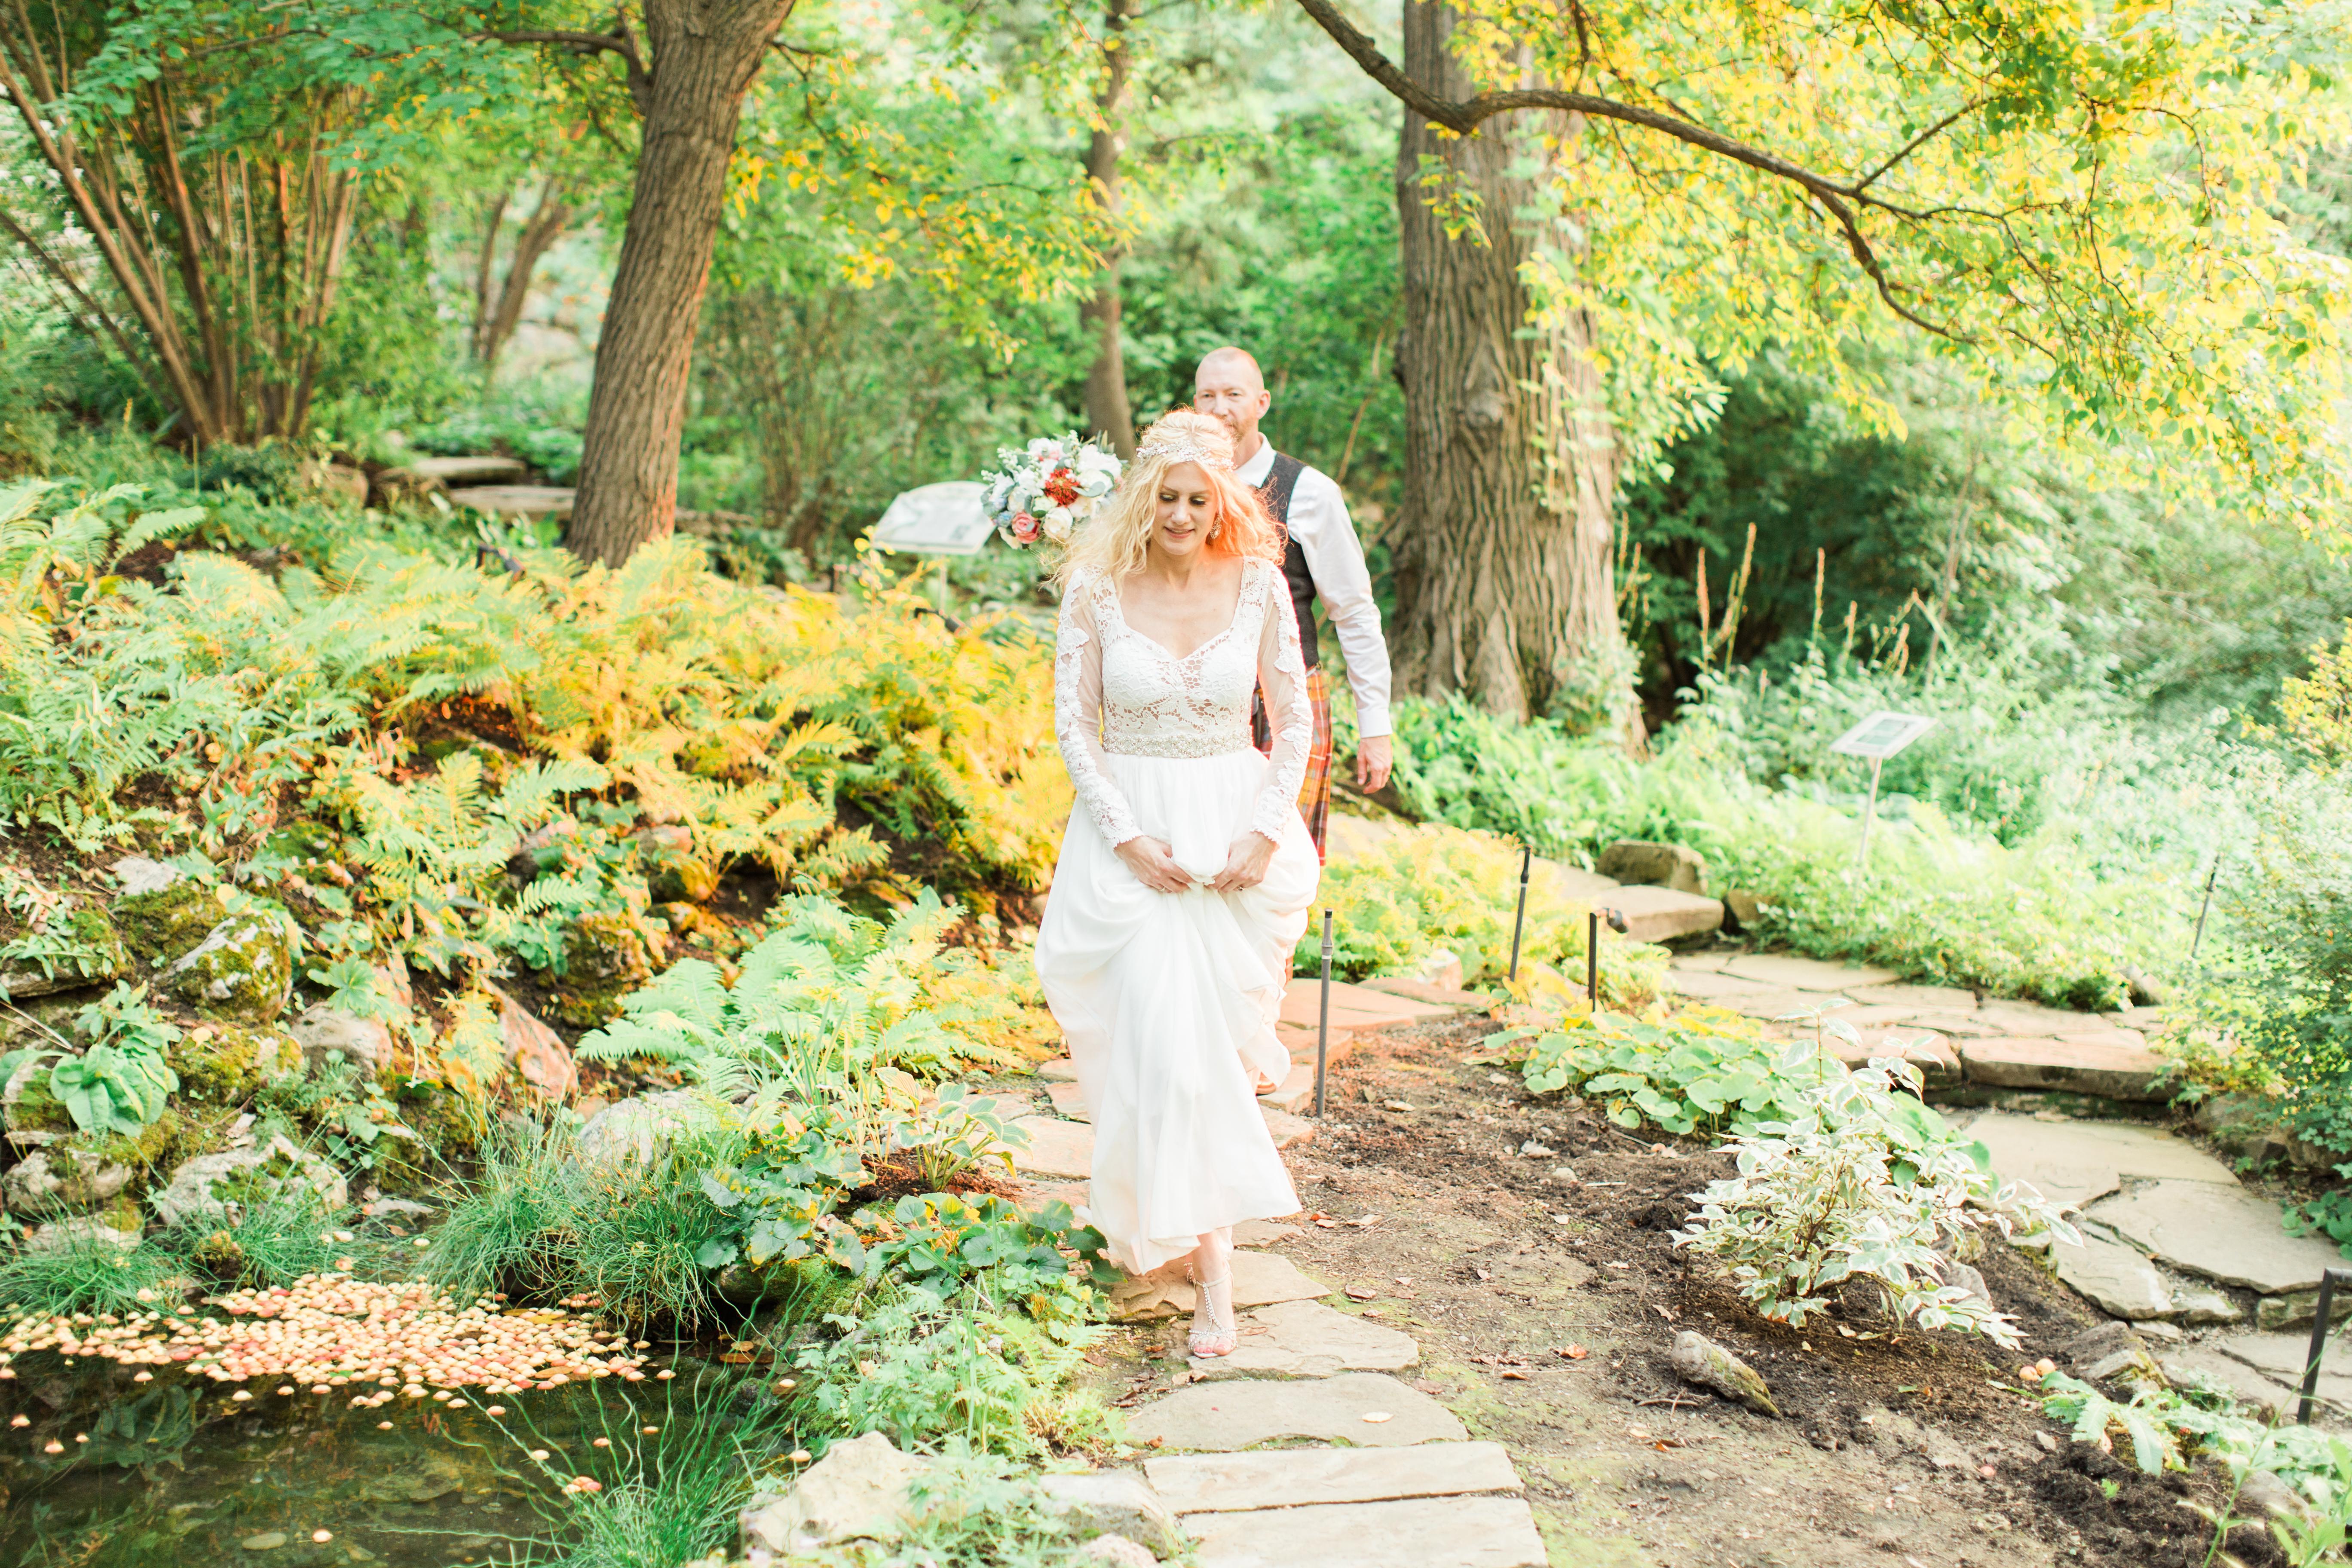 Calgary Wedding Photographer Reader Rock Garden Cafe Golden Light Light Airy Fairy - 25